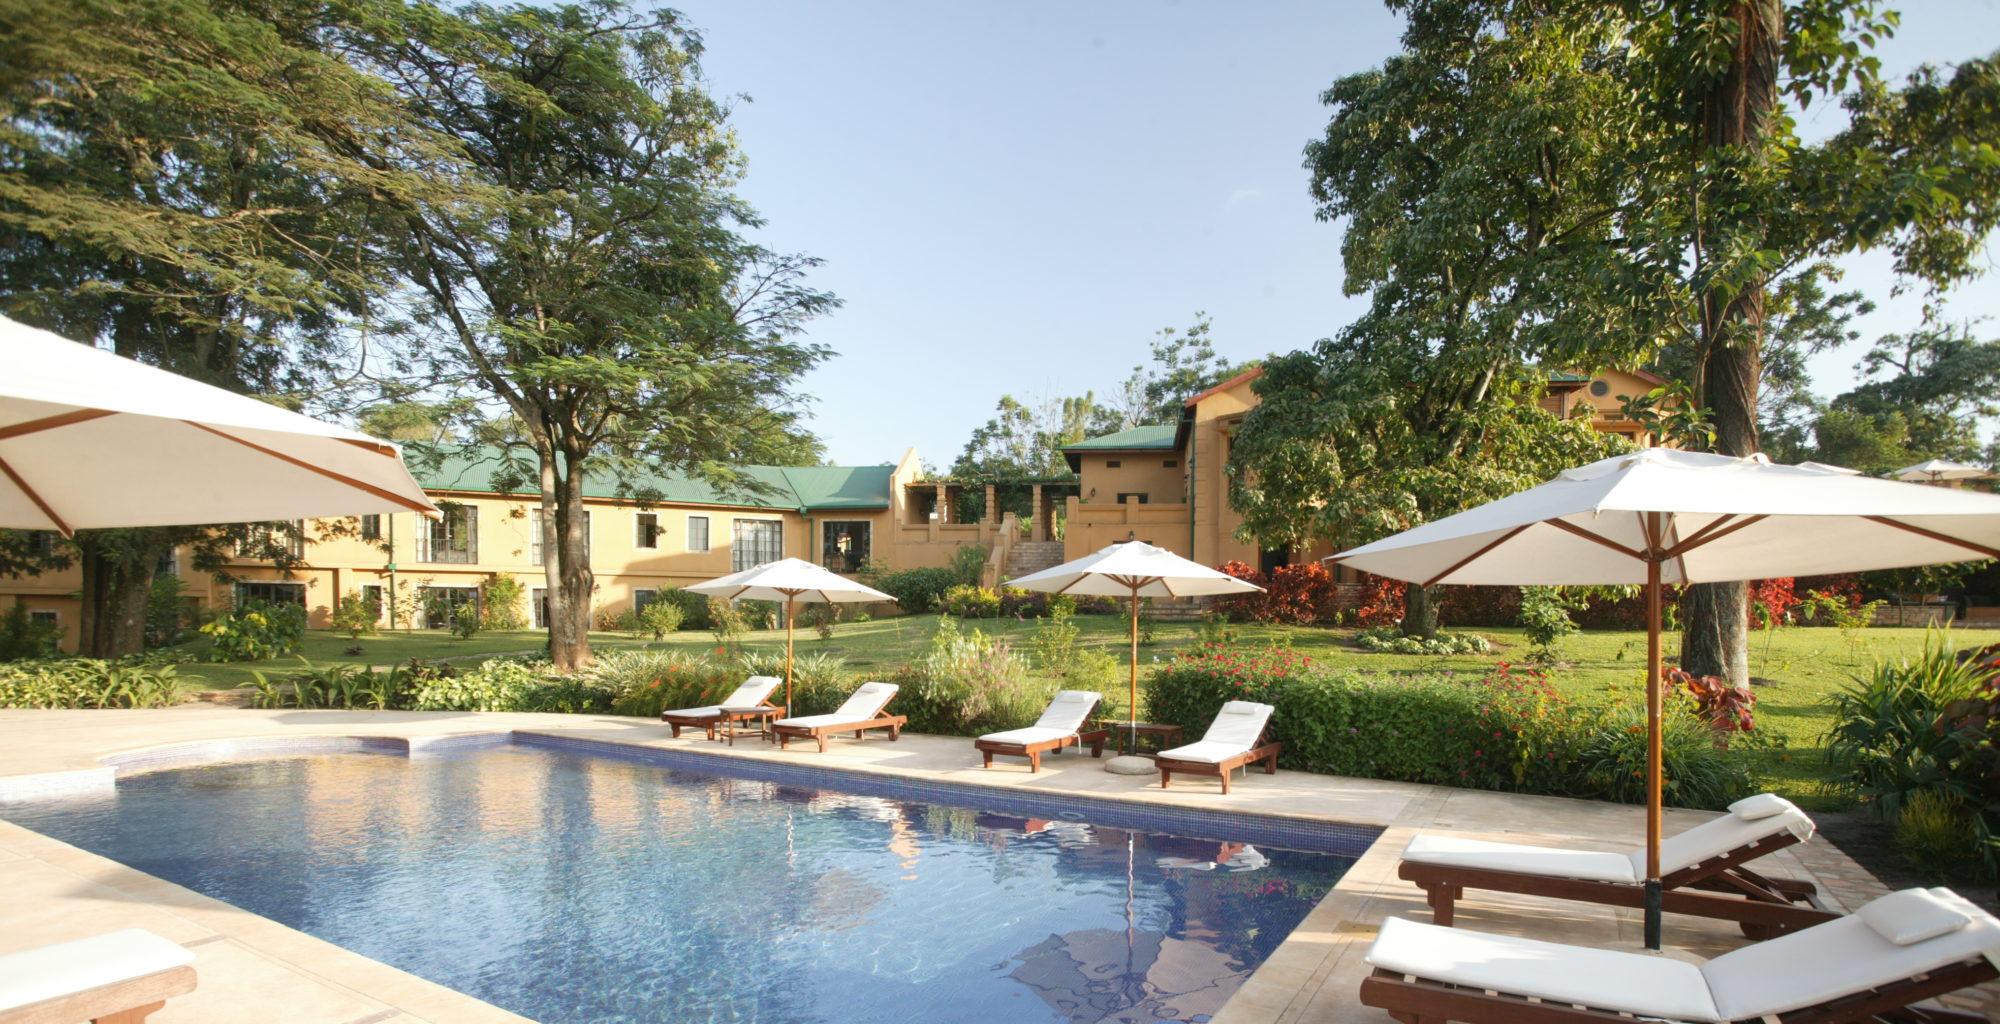 Emin Pasha Uganda Pool